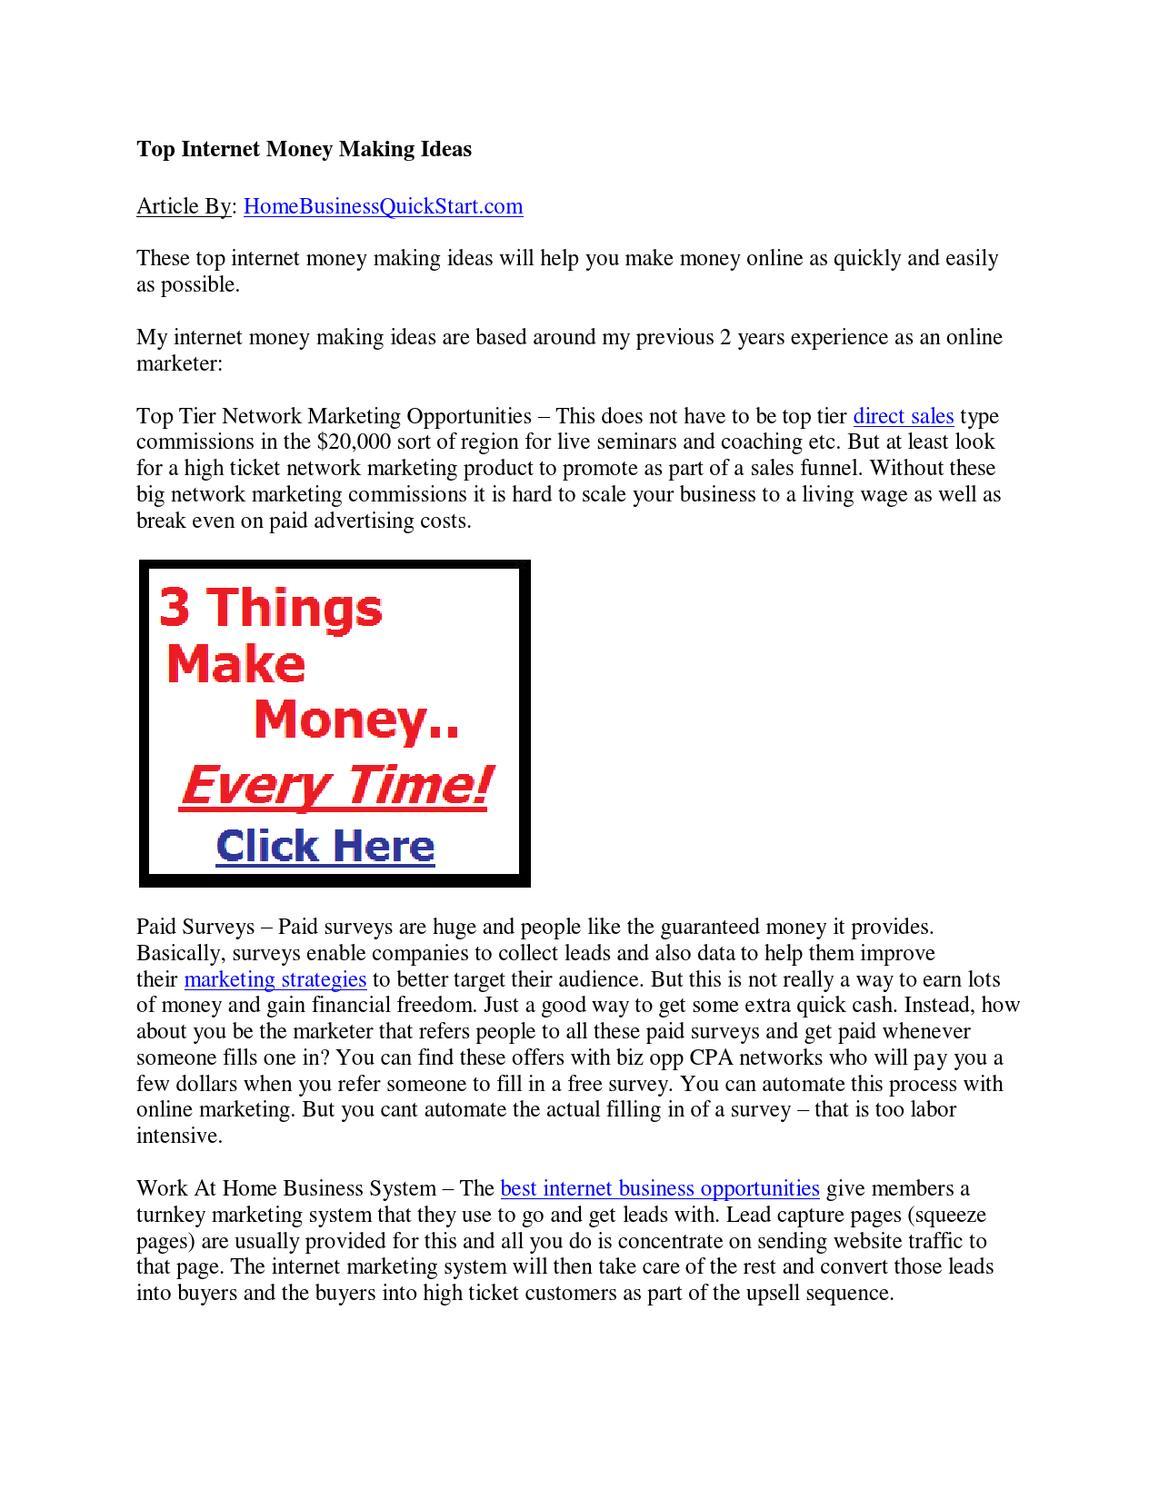 Top Internet Money Making Ideas by bestonline marketingideas - issuu